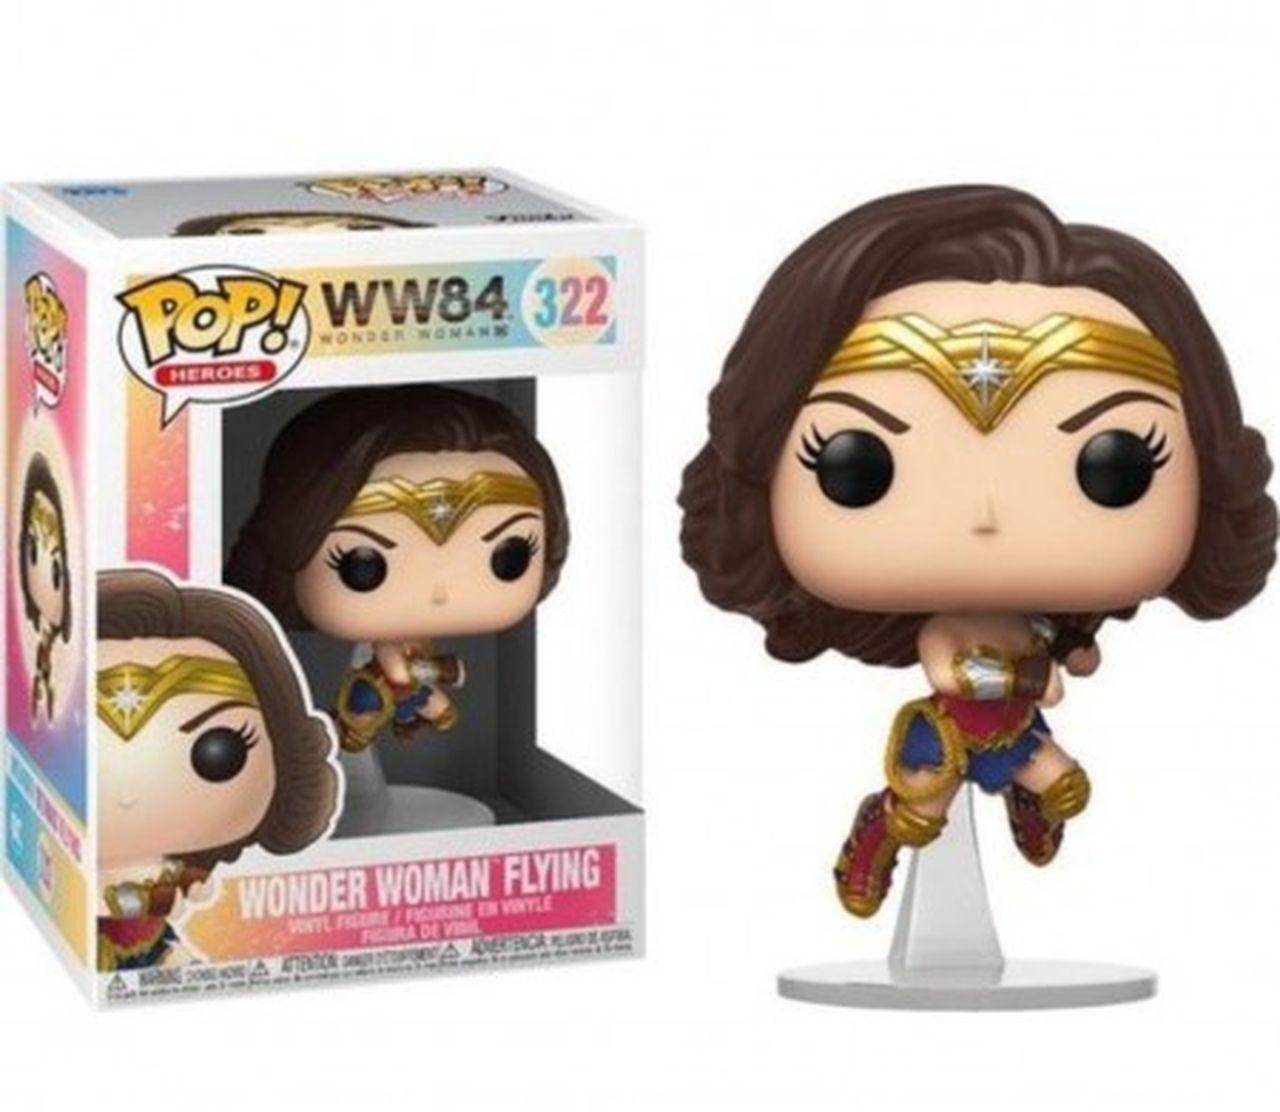 Funko Pop! Mulher-Maravilha Voando (Wonder Woman Flying): Mulher-Maravilha 1984 (Wonder Woman 1984) #322 - Funko